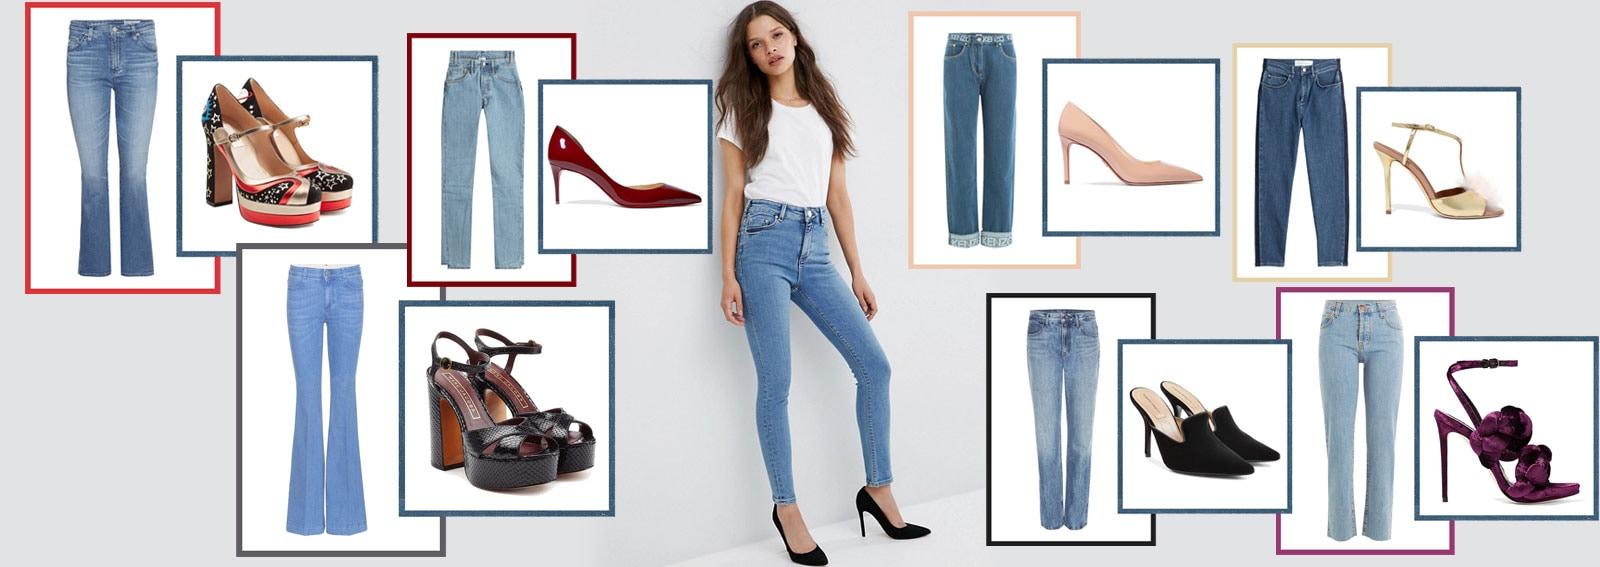 DESKTOP_jeans_tacco